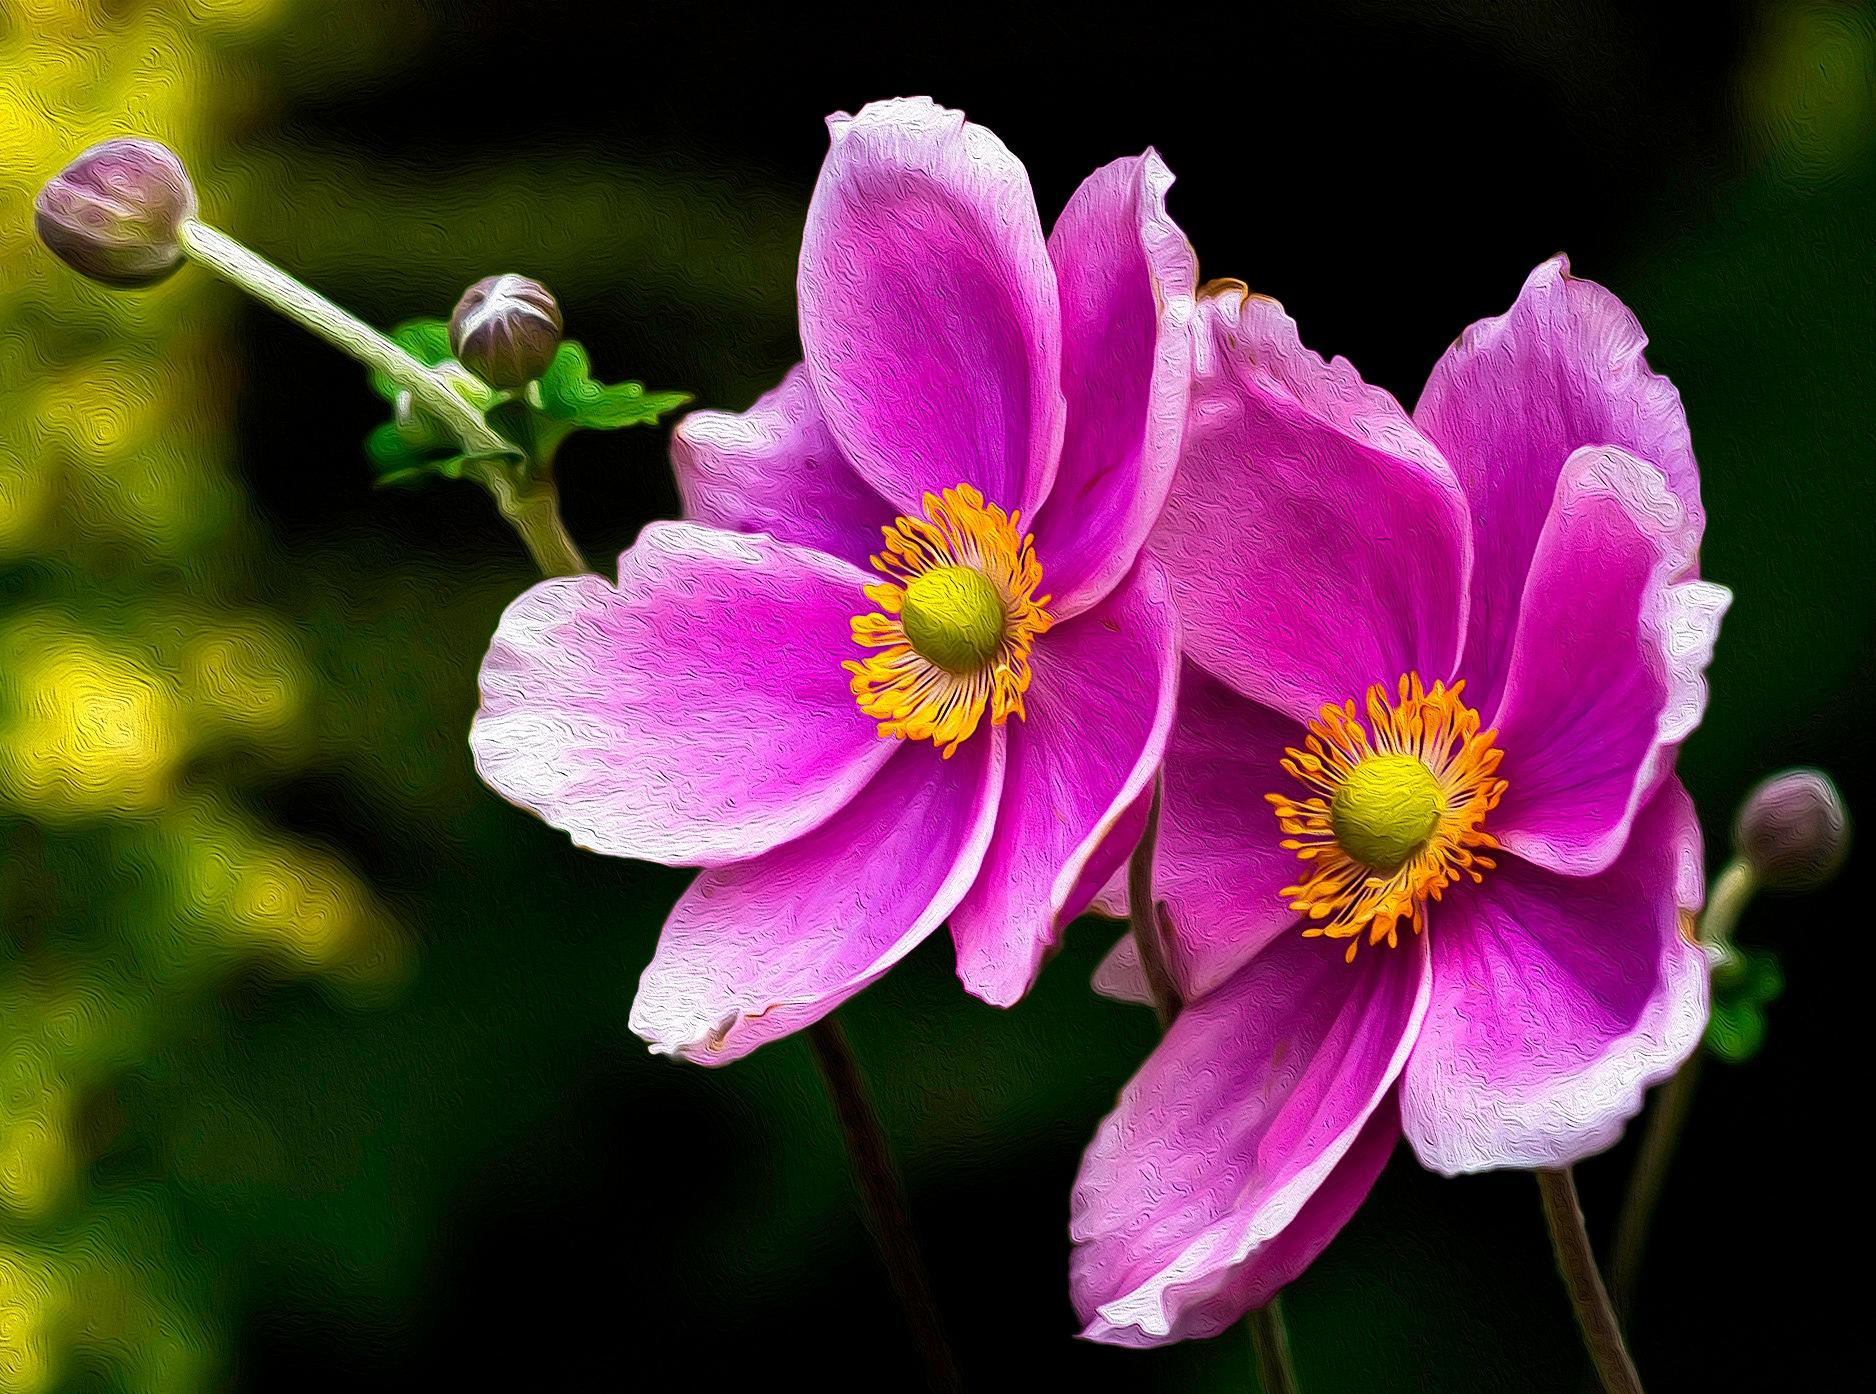 Japanese Anemones by John Roberts